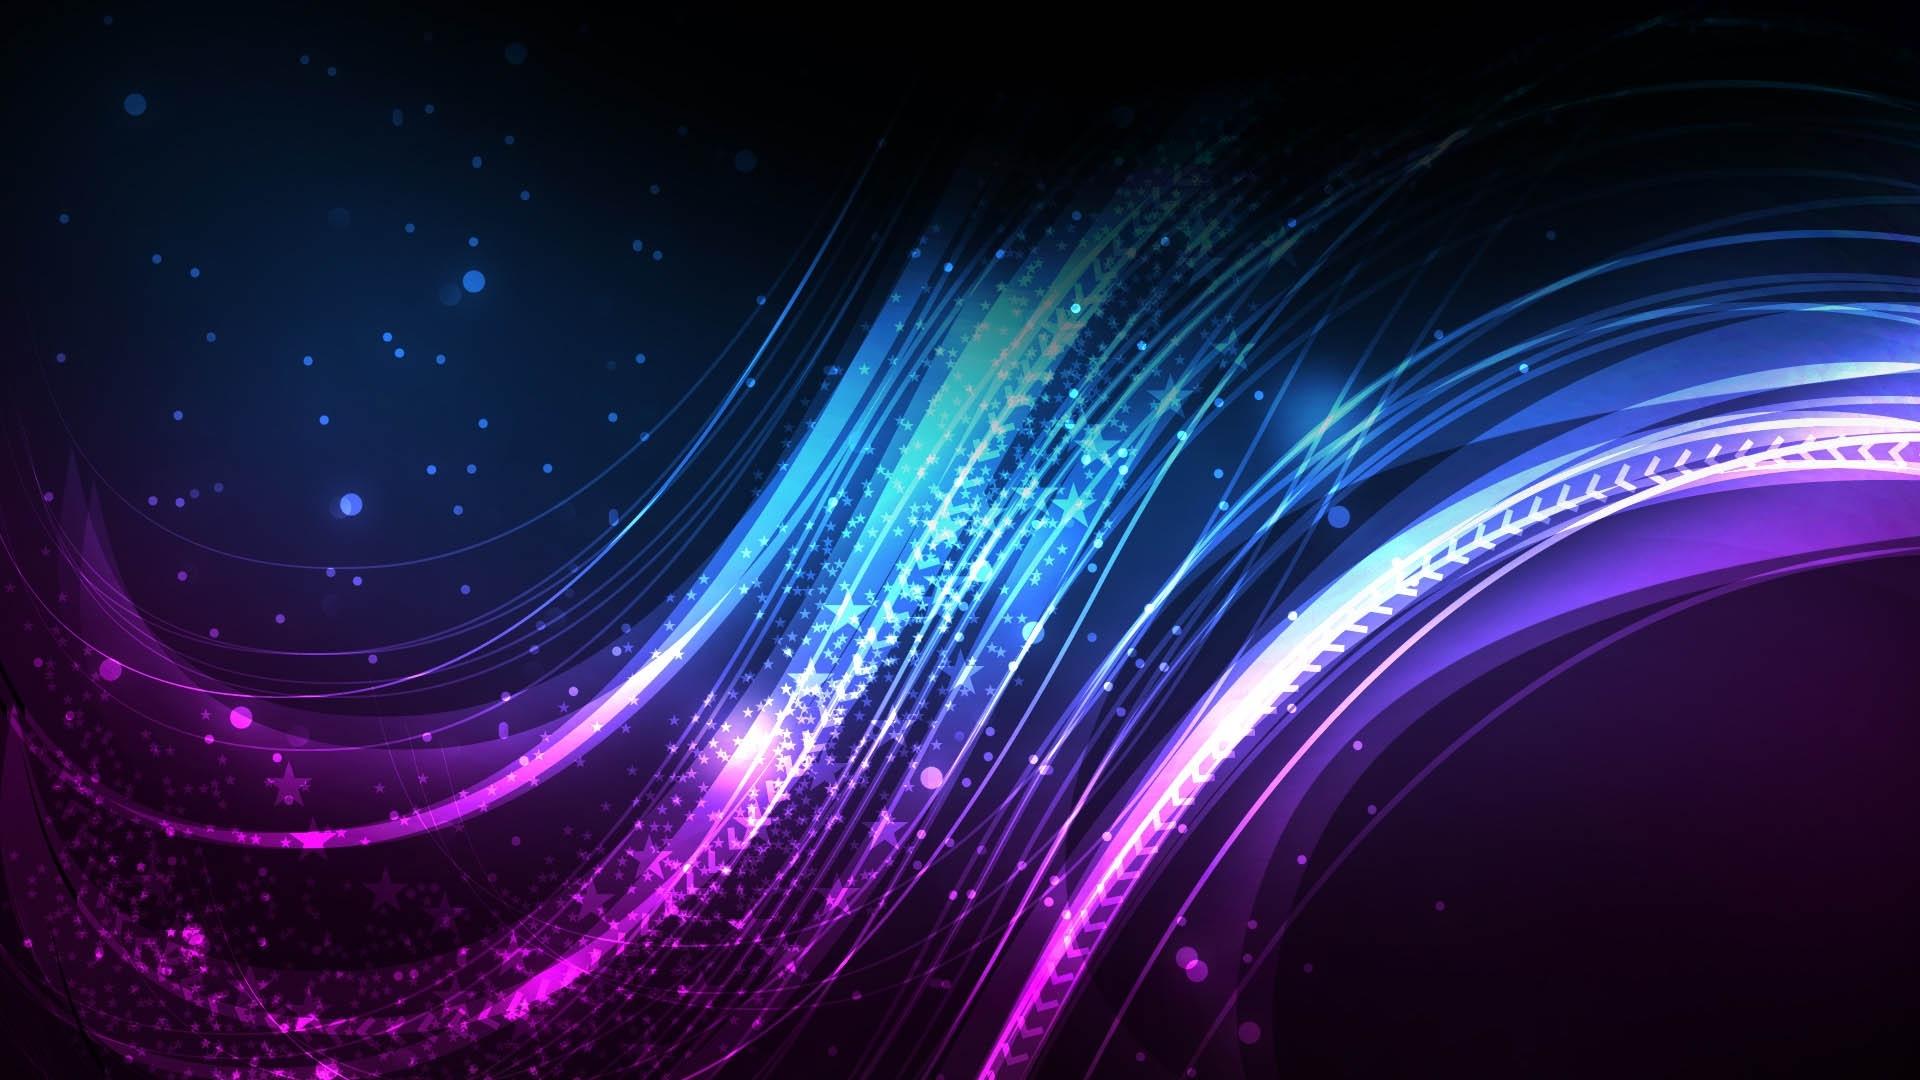 hd blue and purple wallpaper   pixelstalk